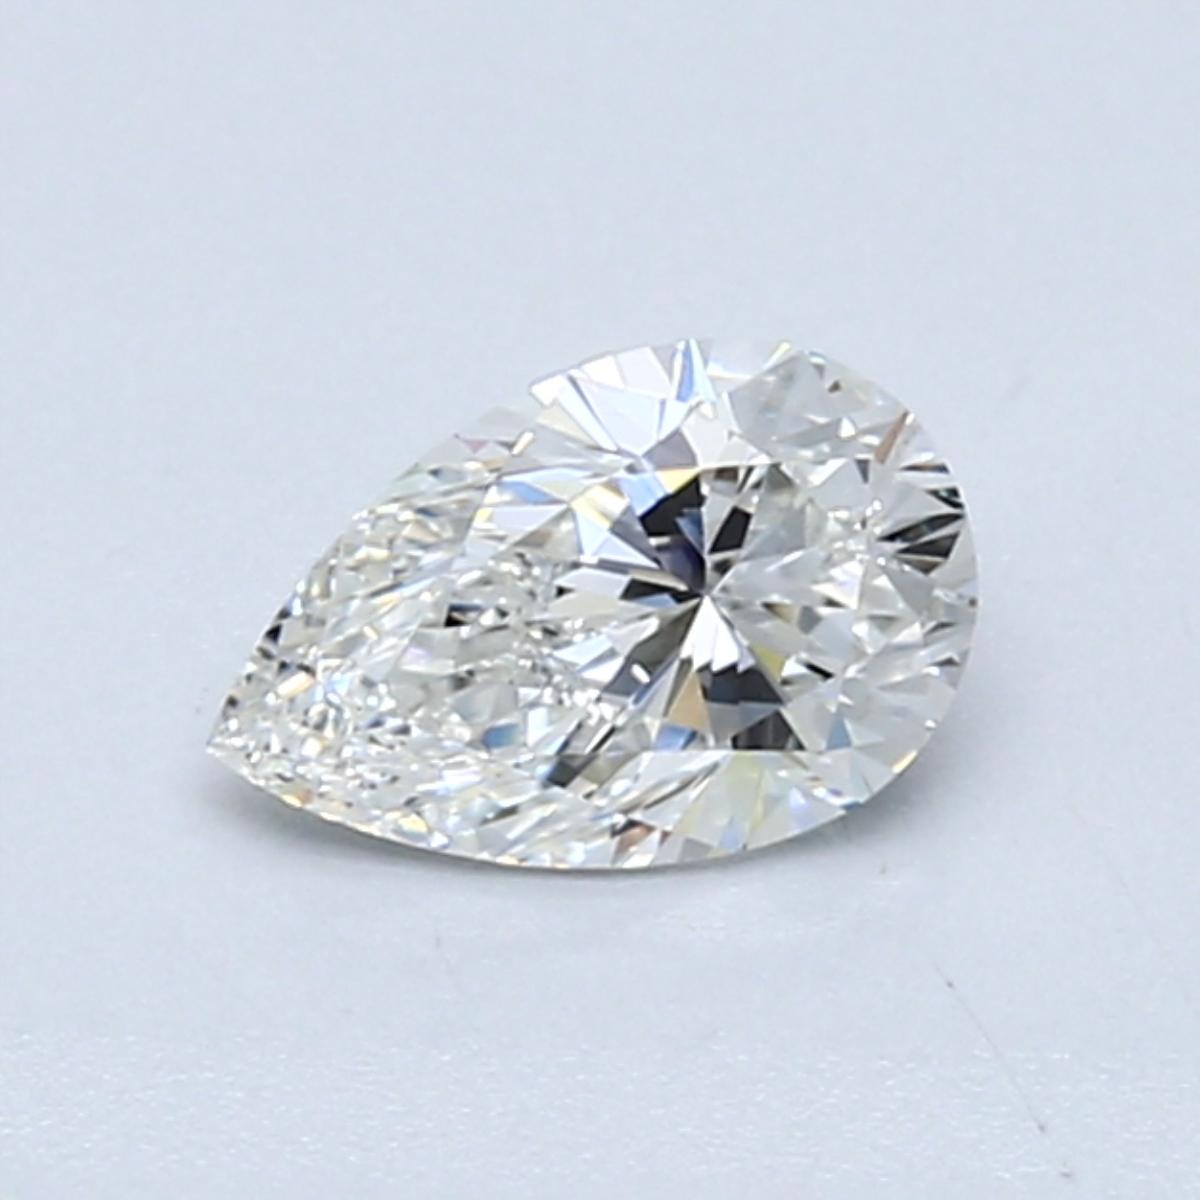 0.62 PS Diamond (F, SI1)